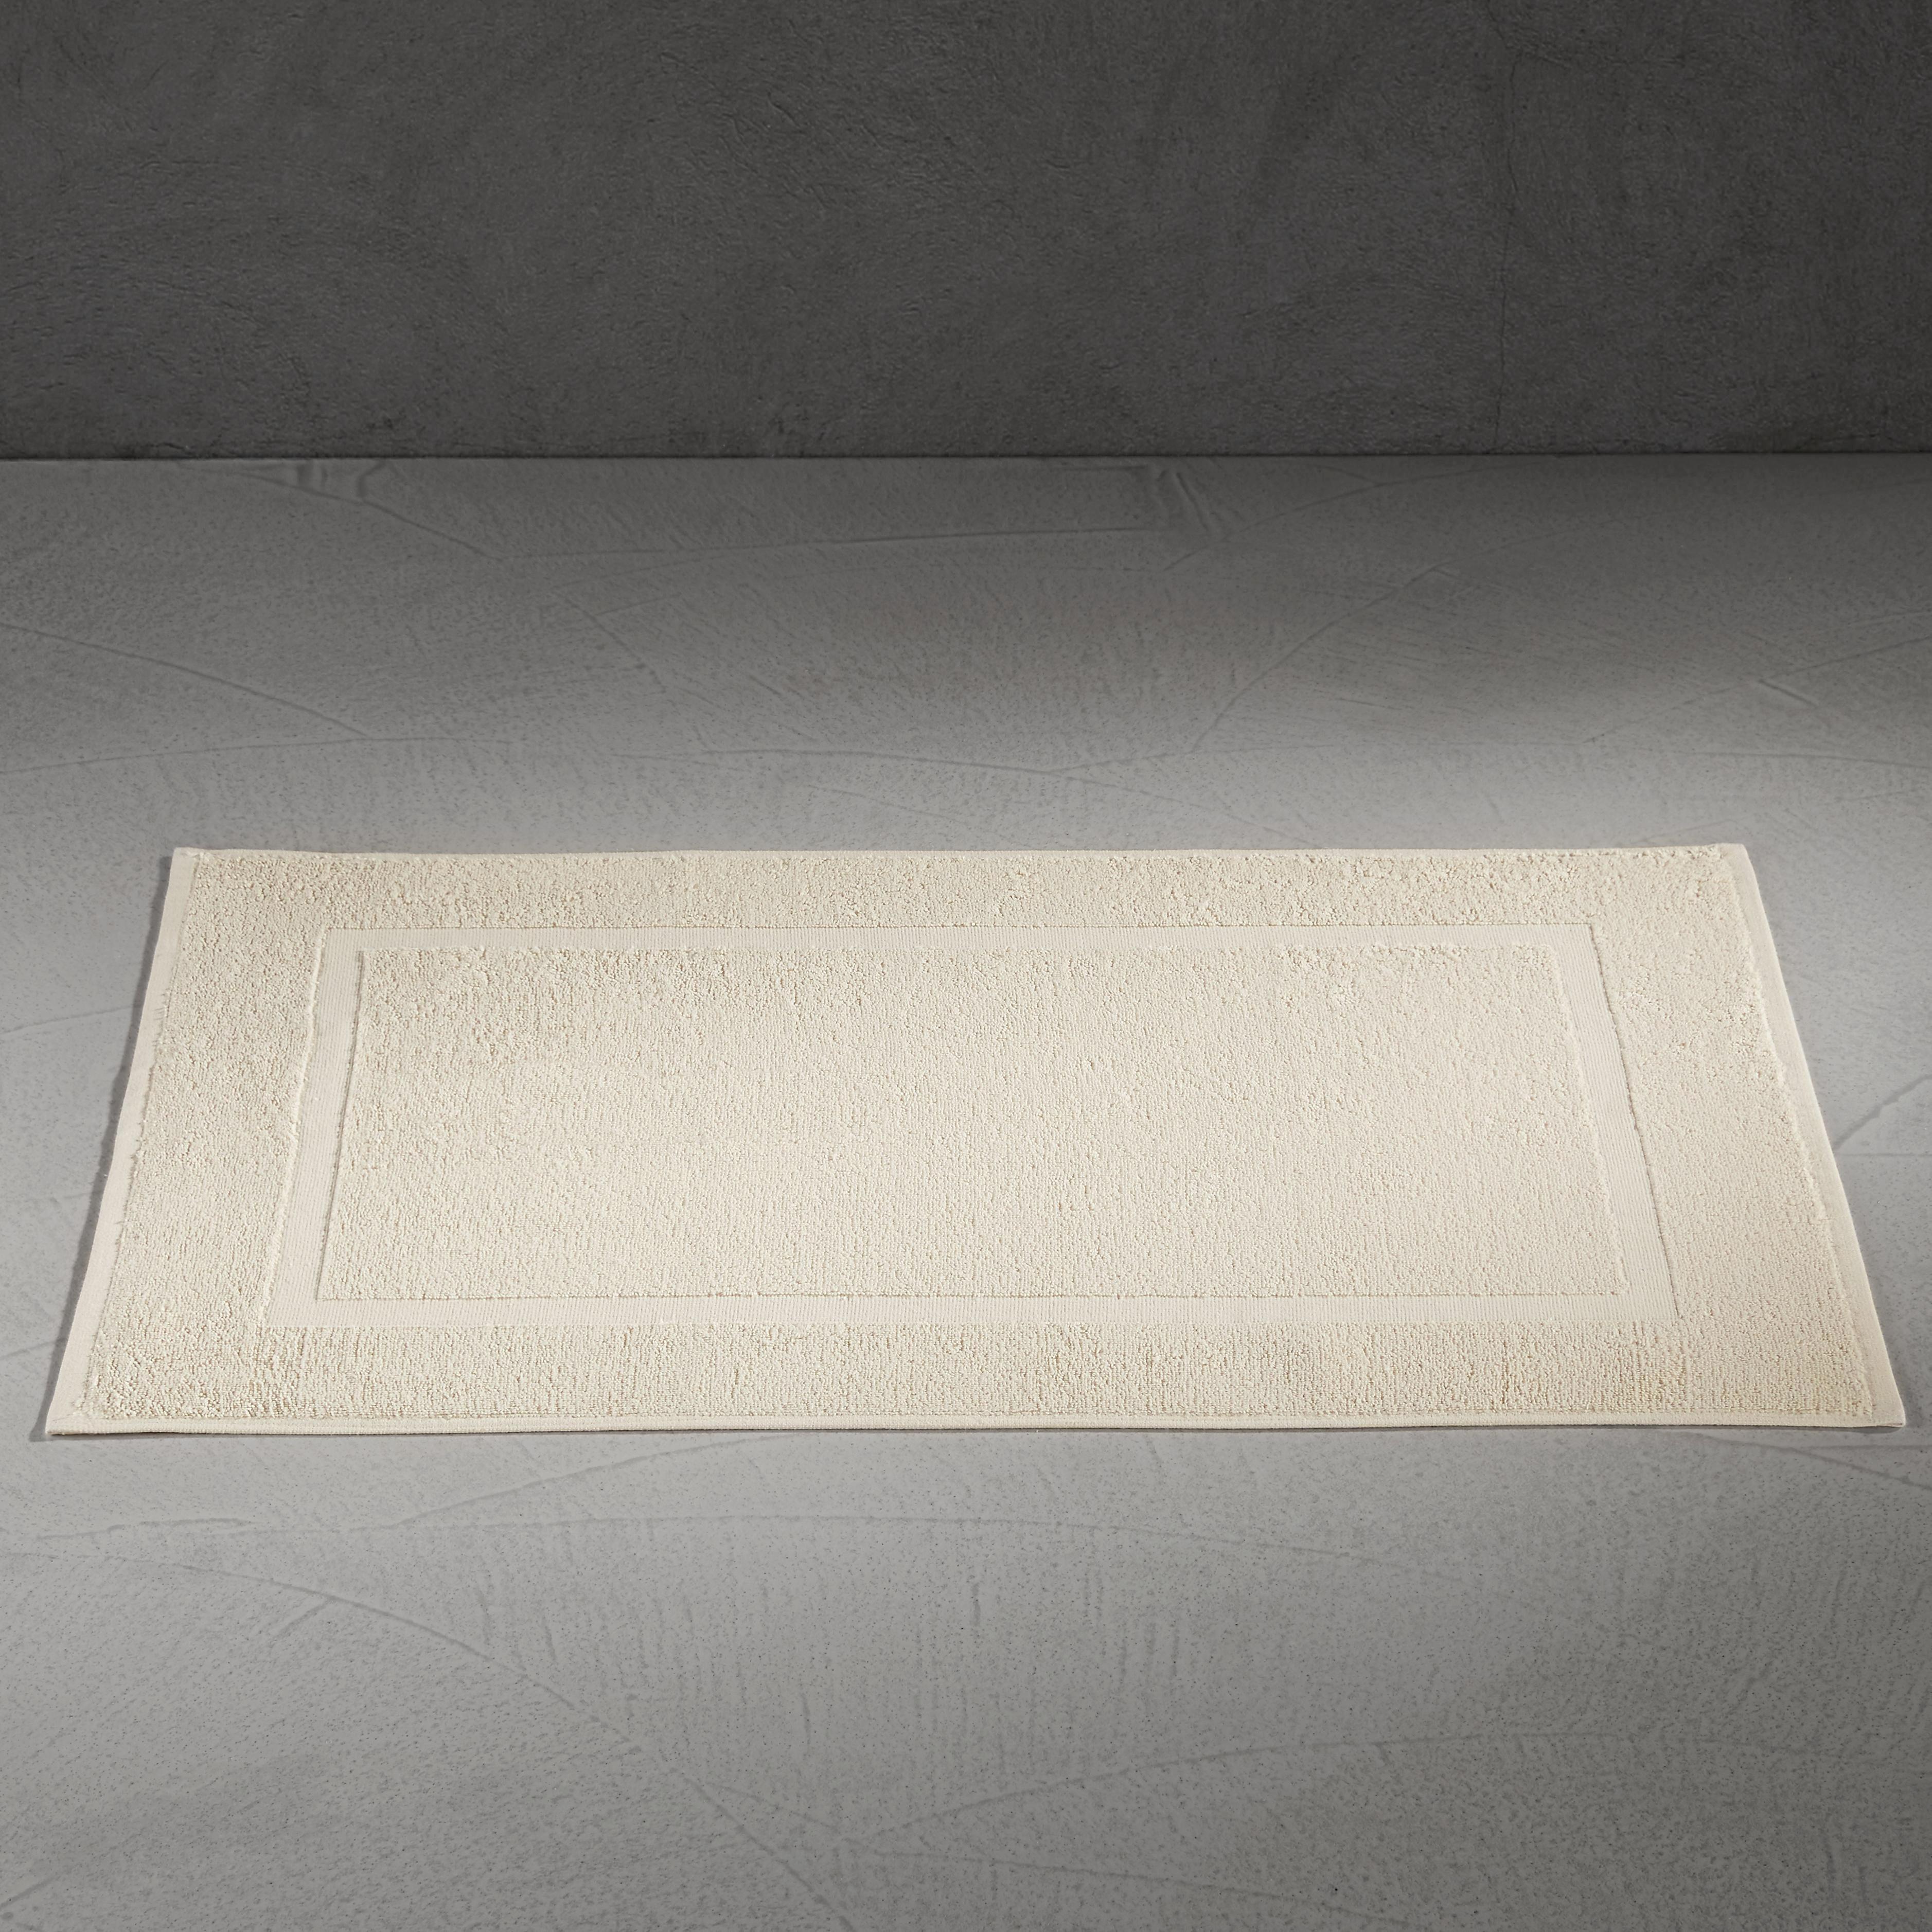 Badematte Dyckhoff 50x75cm - Naturfarben, Textil (50/75cm) - DYCKHOFF